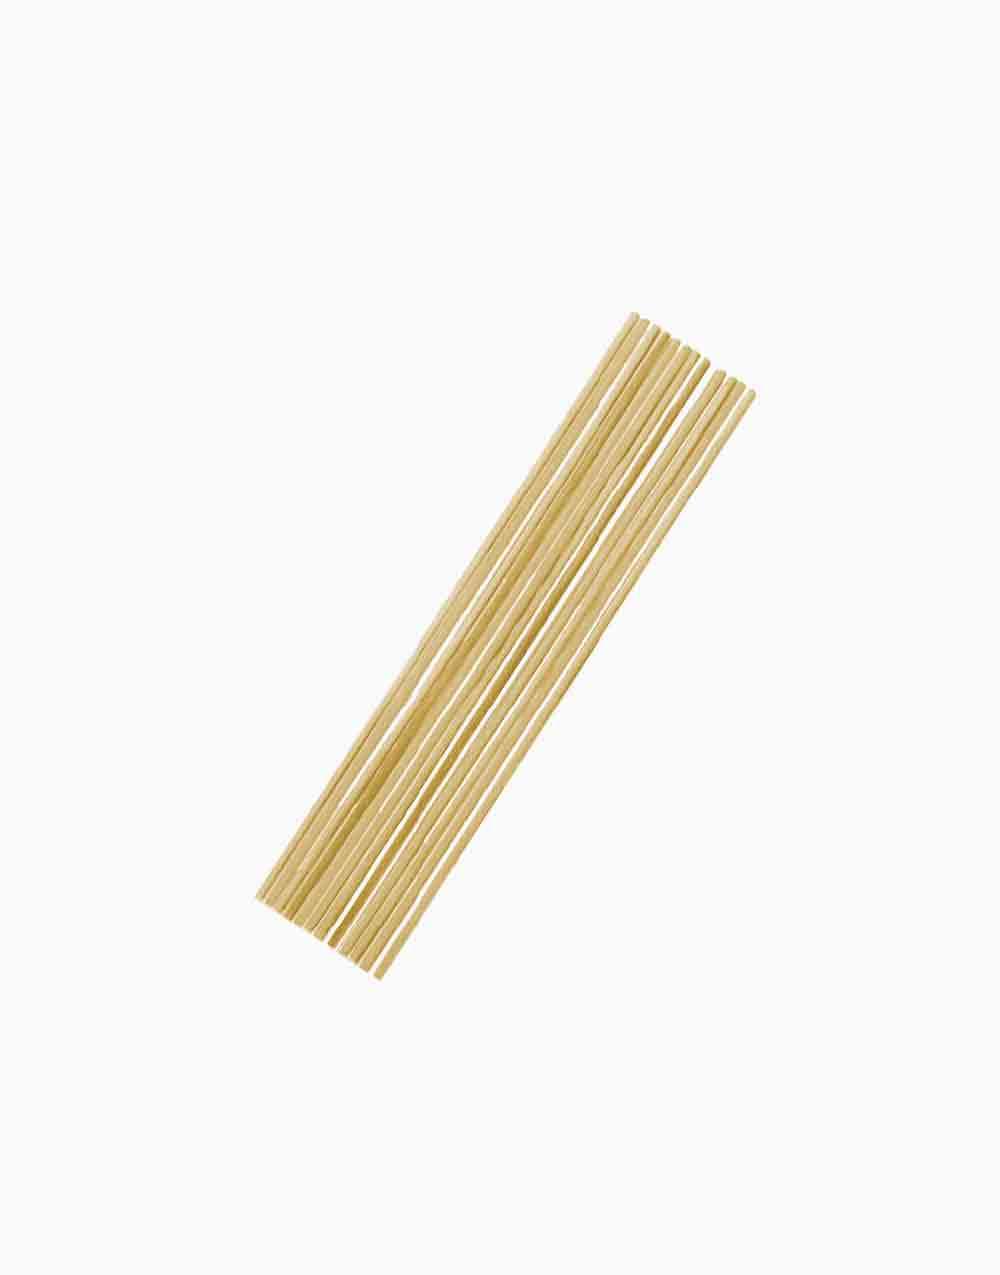 "POREX ""No-Flip"" E-reed Stick 12s Bundle (10"") by Pure Bliss | Natural"